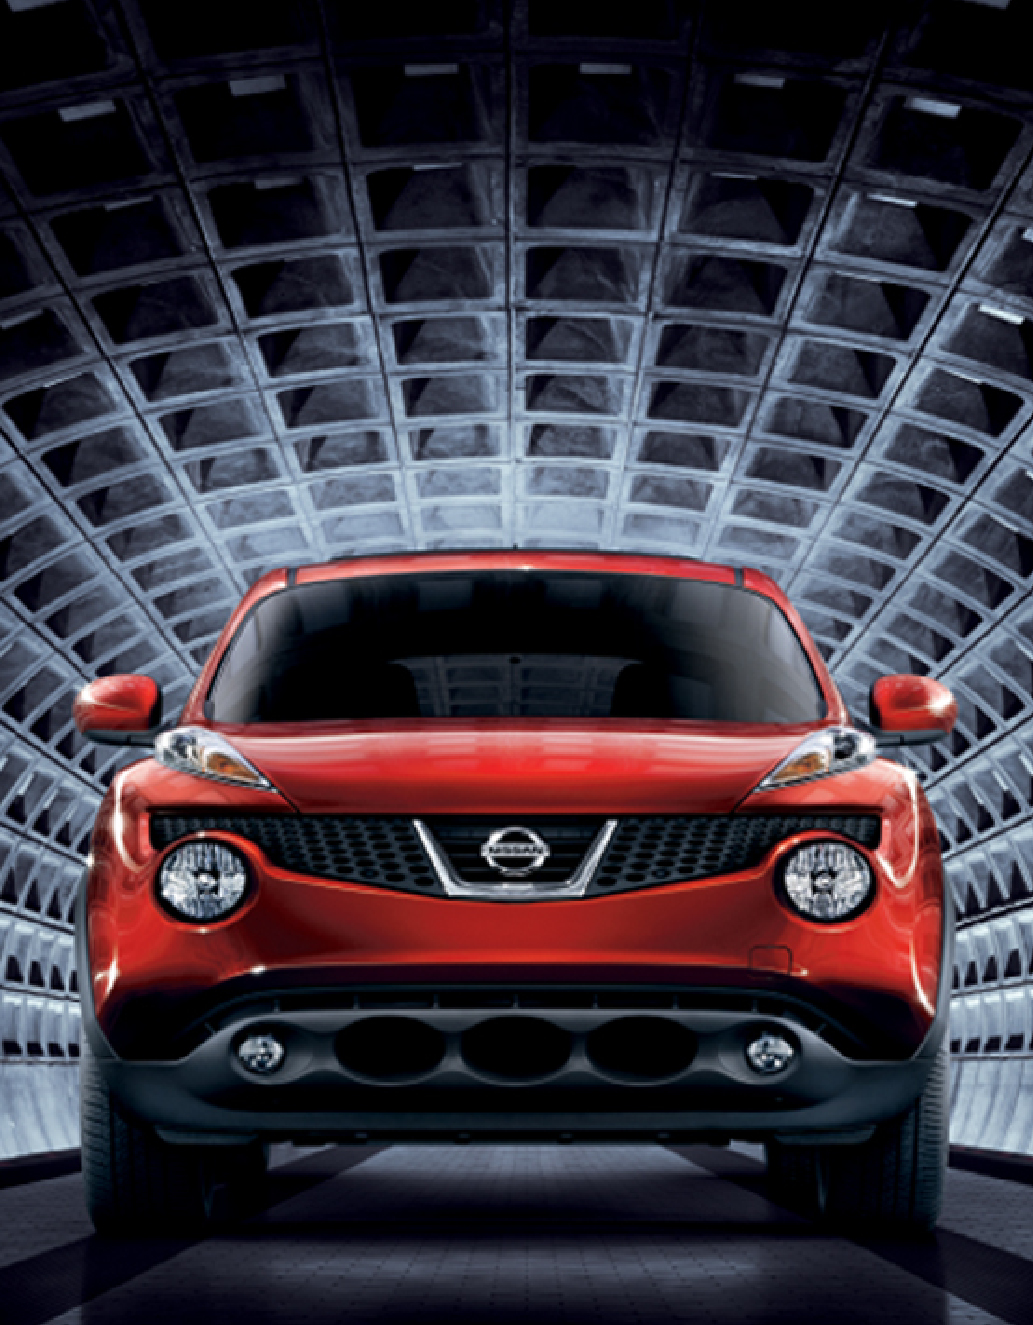 Southside_Nissan_152854216